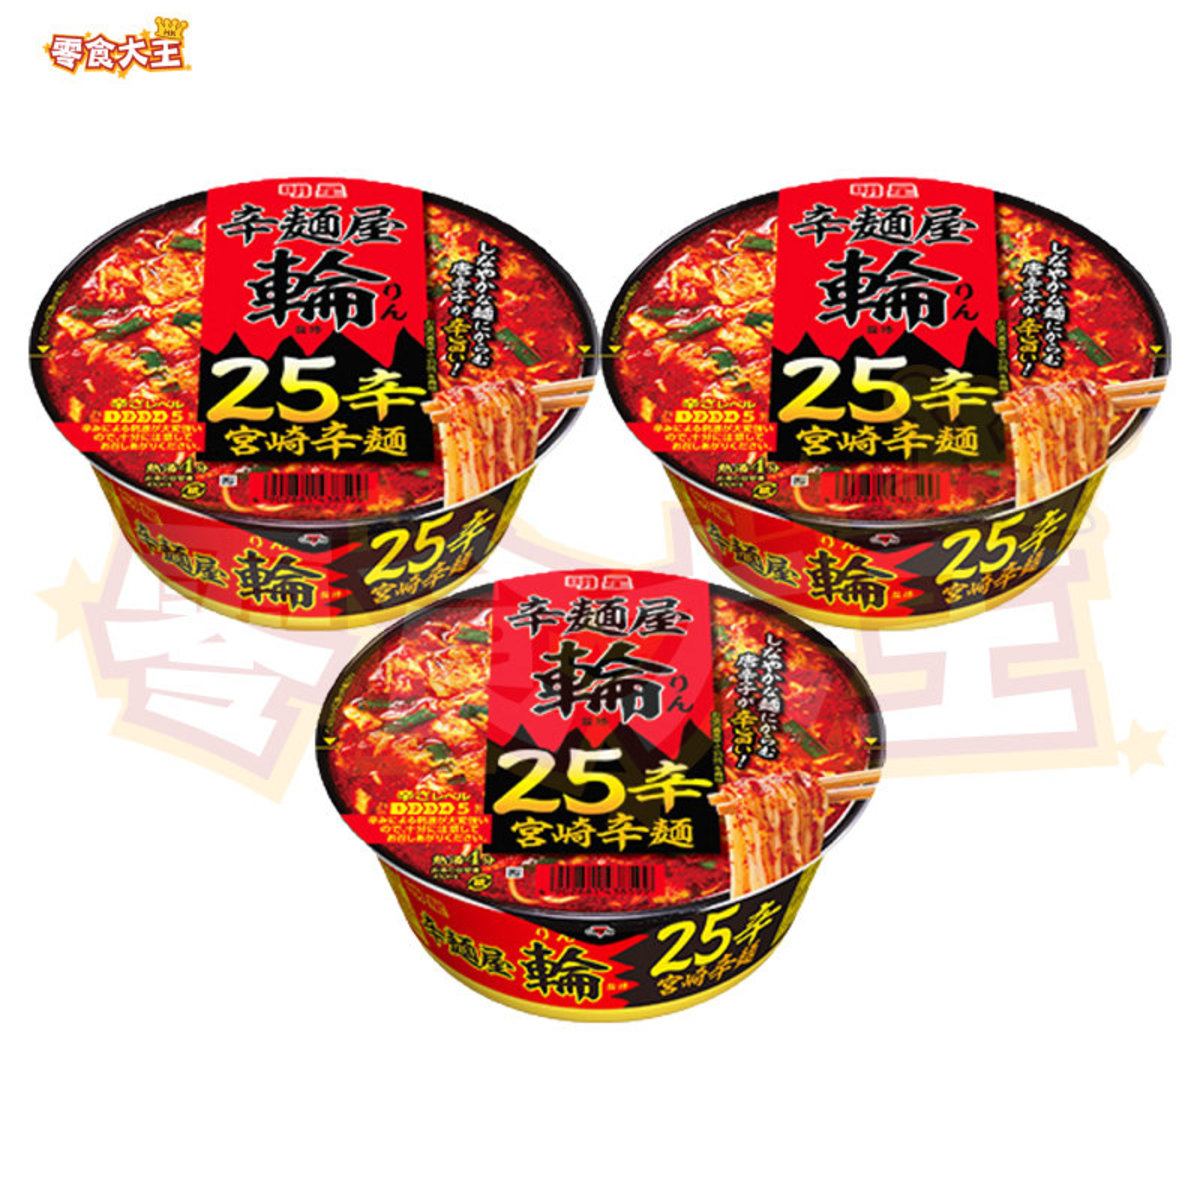 Karamenya Rin 25Kara Miyazaki Karamen 107g x 3 boxes (4902881438599_3)